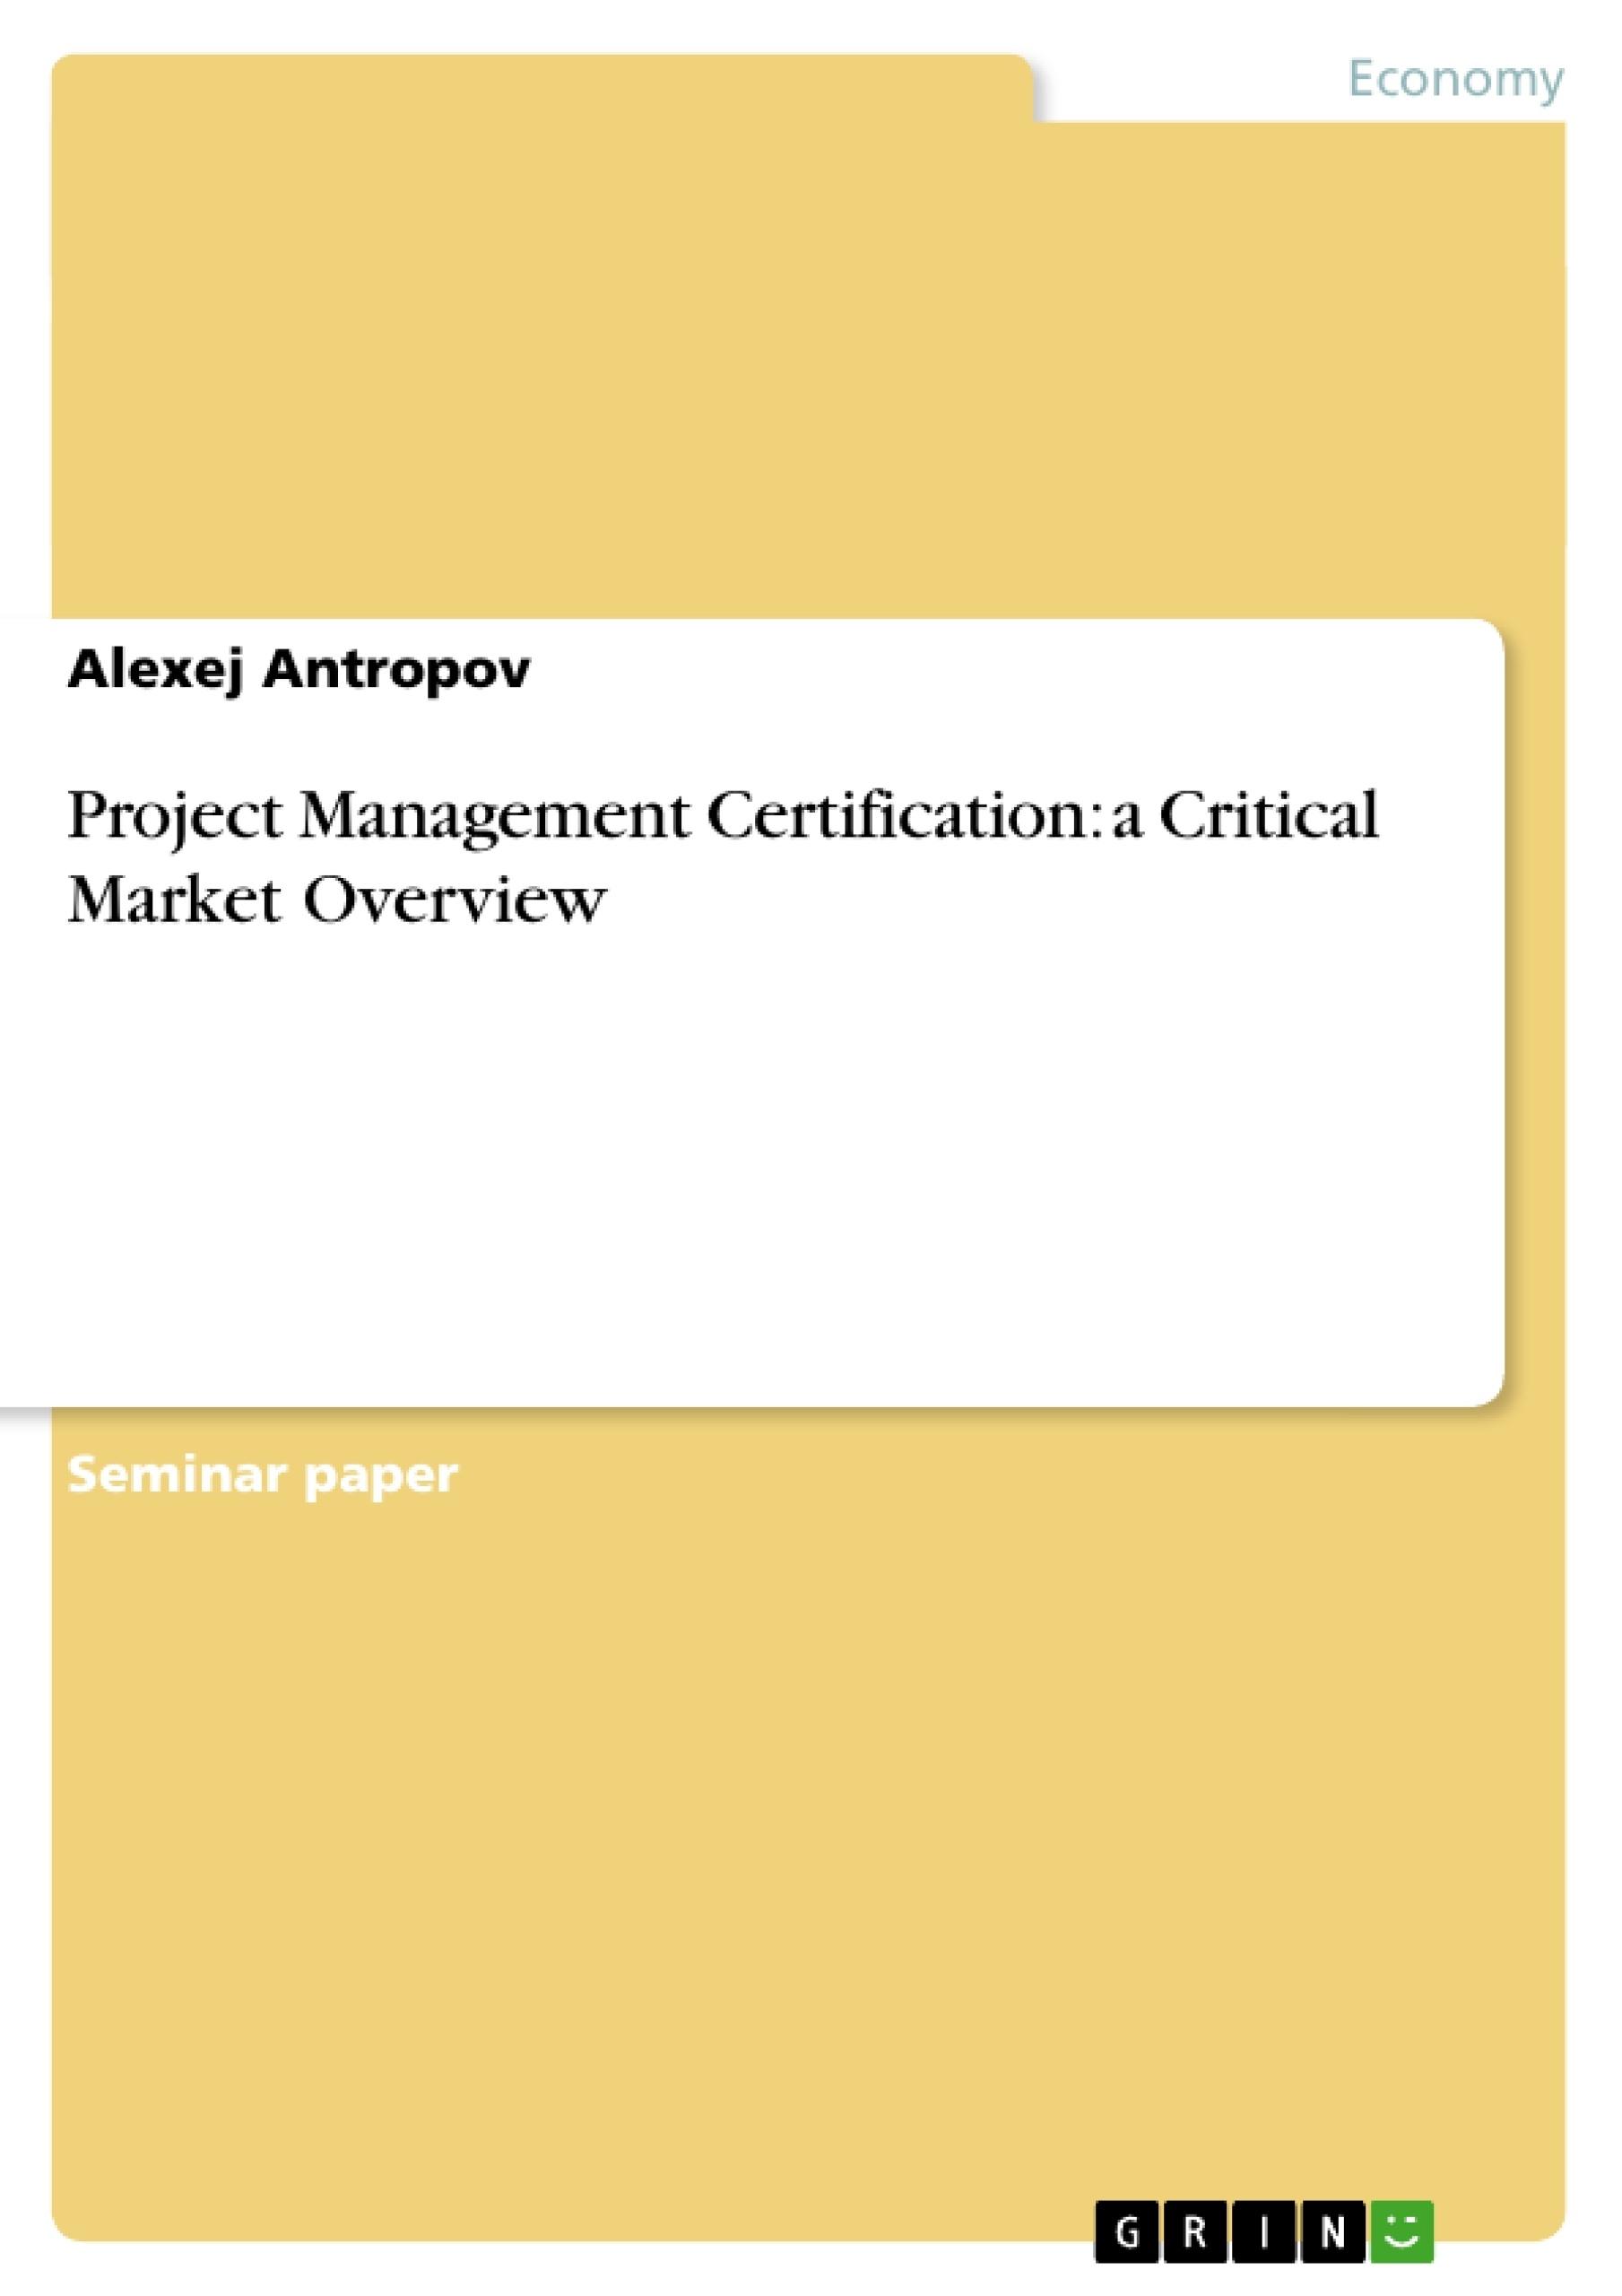 Title: Project Management Certification: a Critical Market Overview